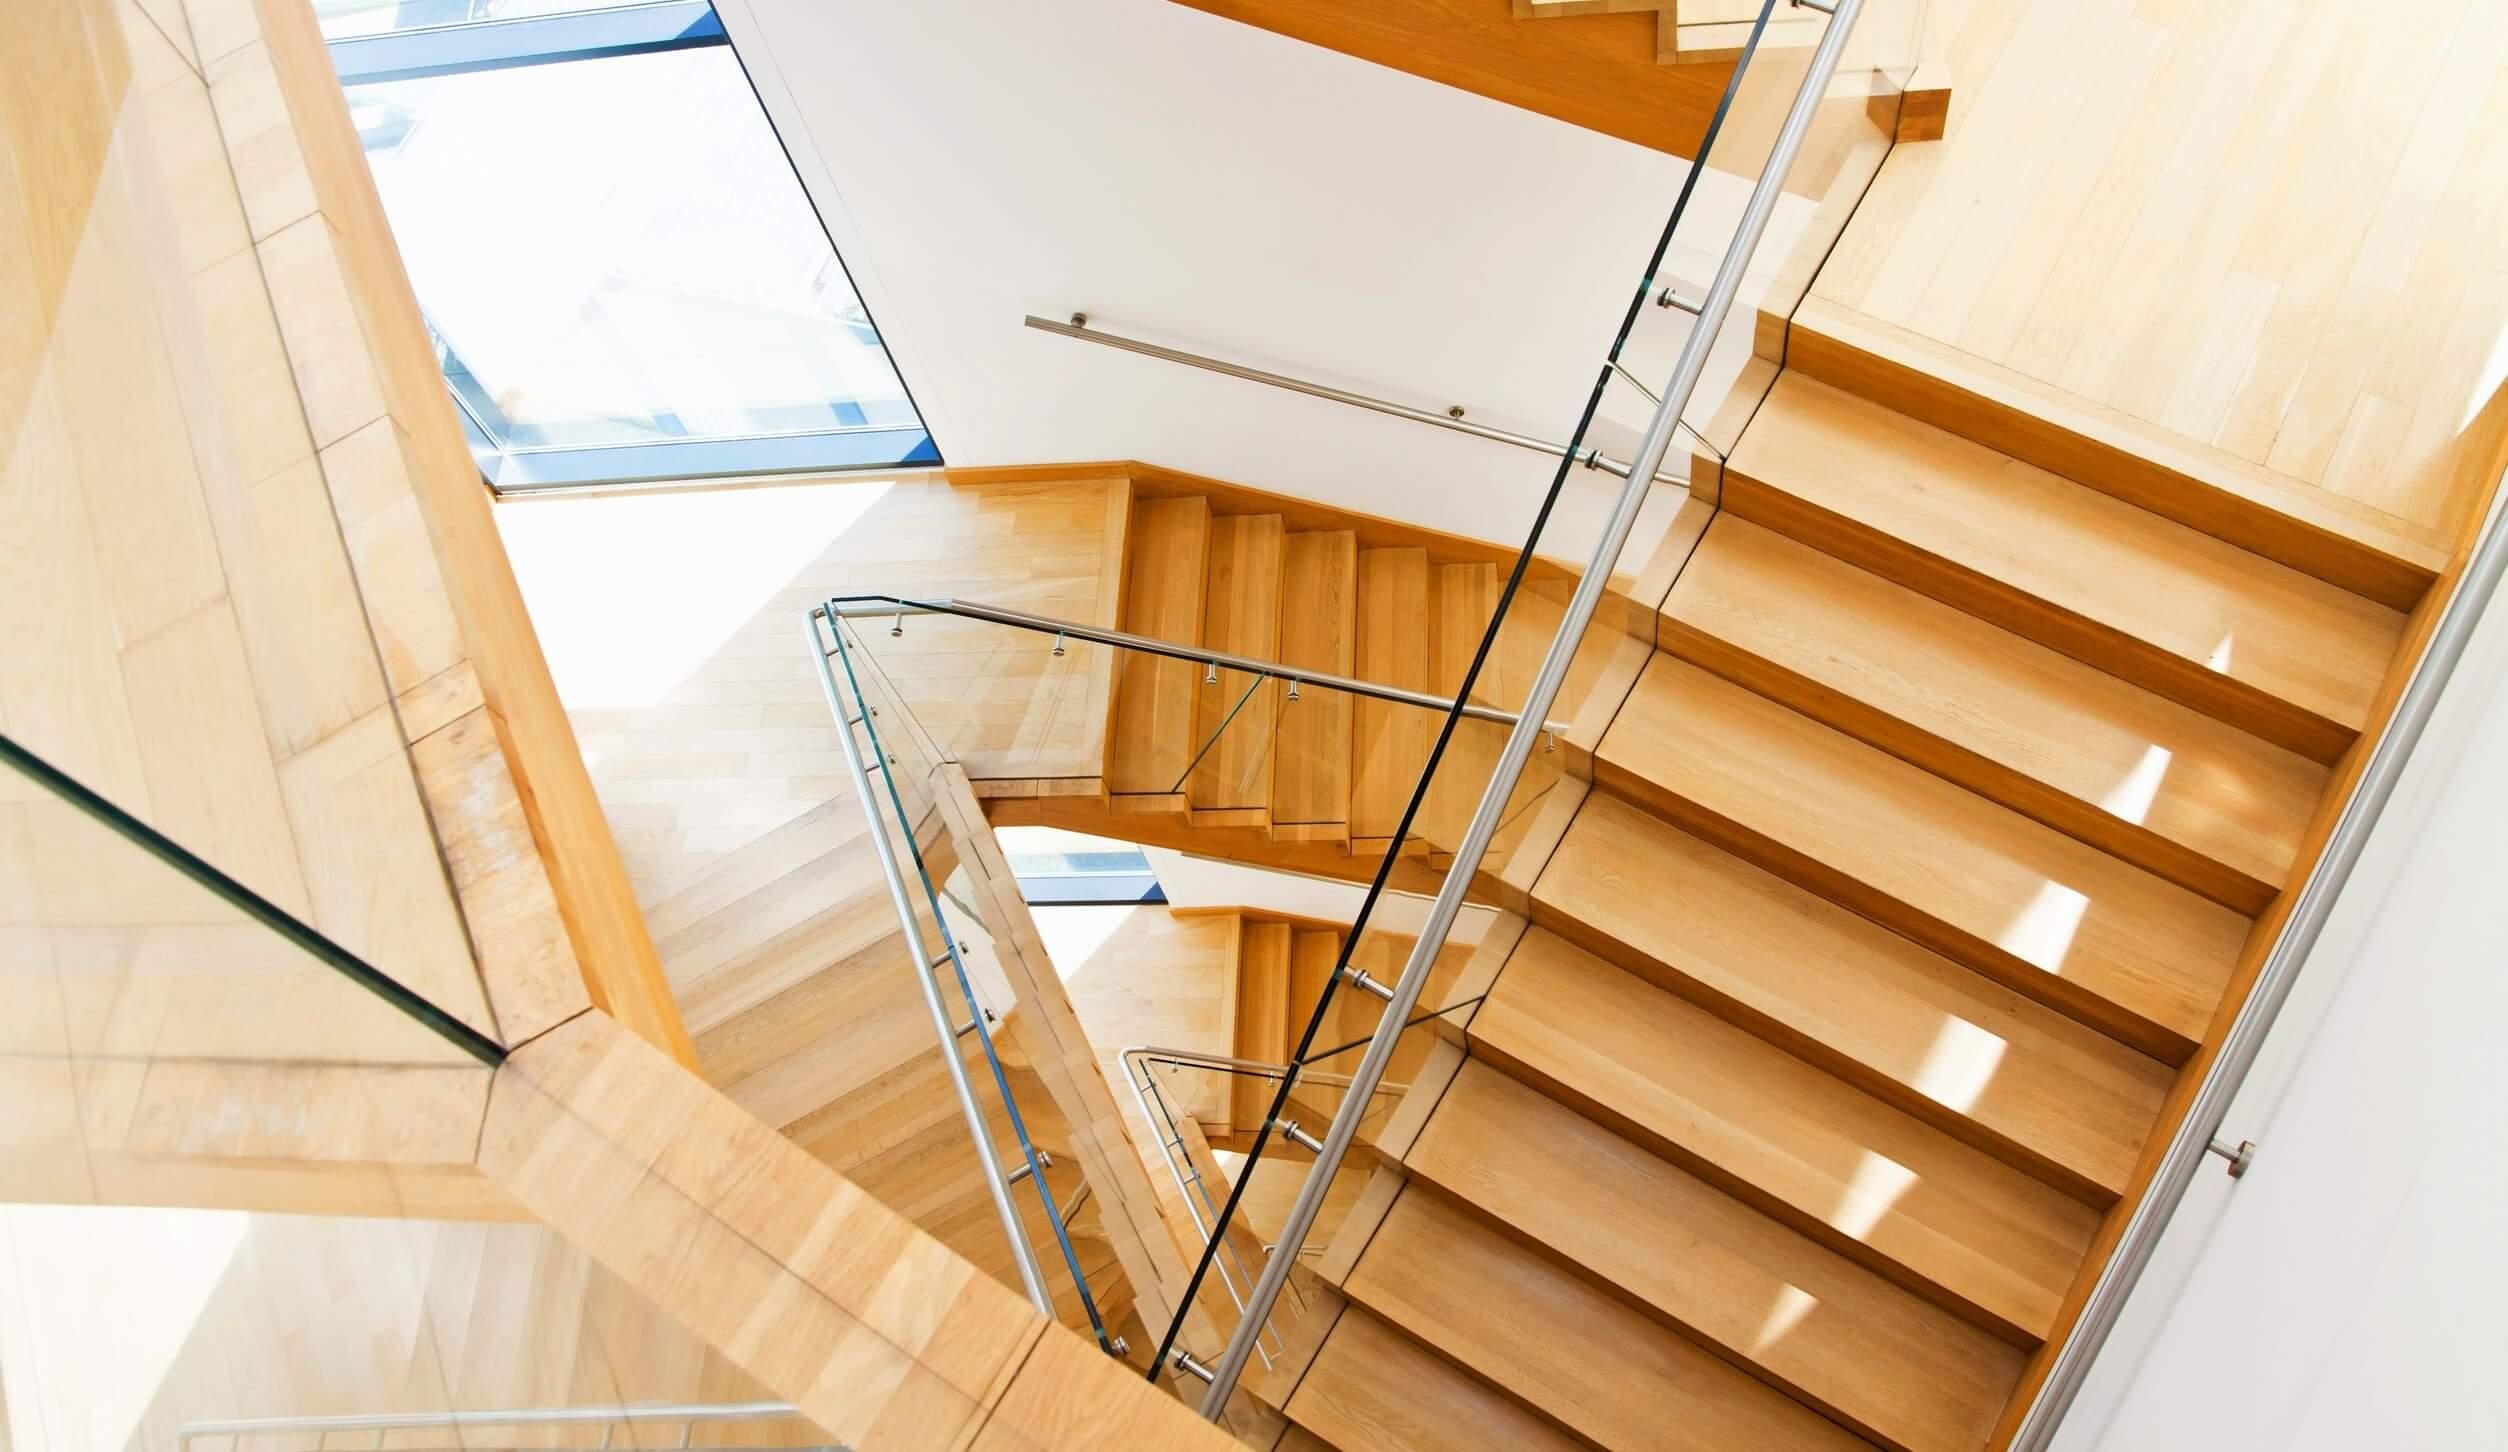 Treppenschutzgitter Treppengitter bauweise geländer 360 grad